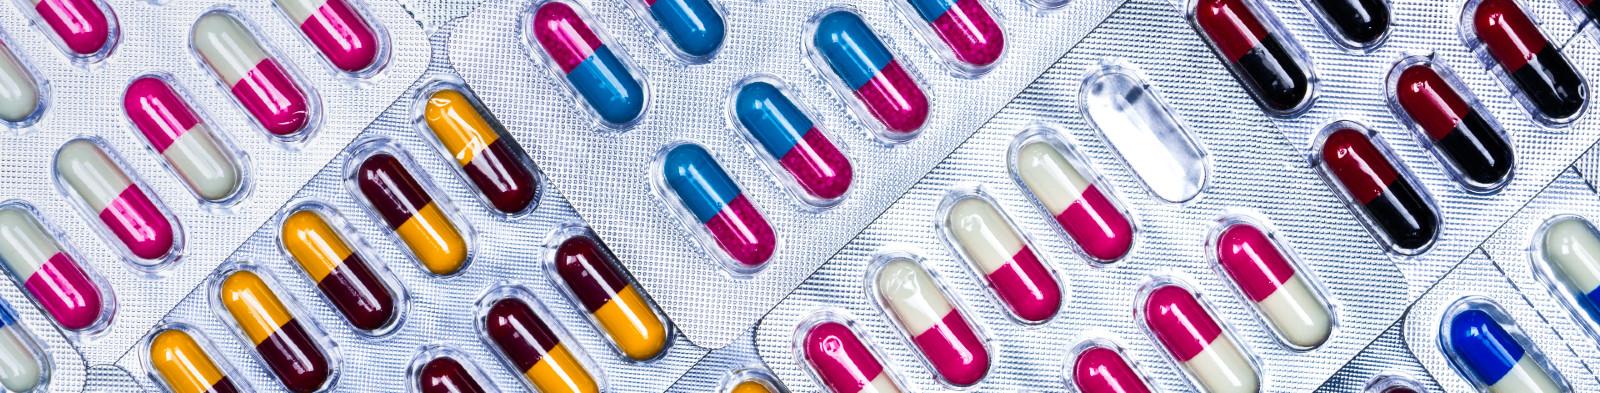 Medicine capsules in blister packs